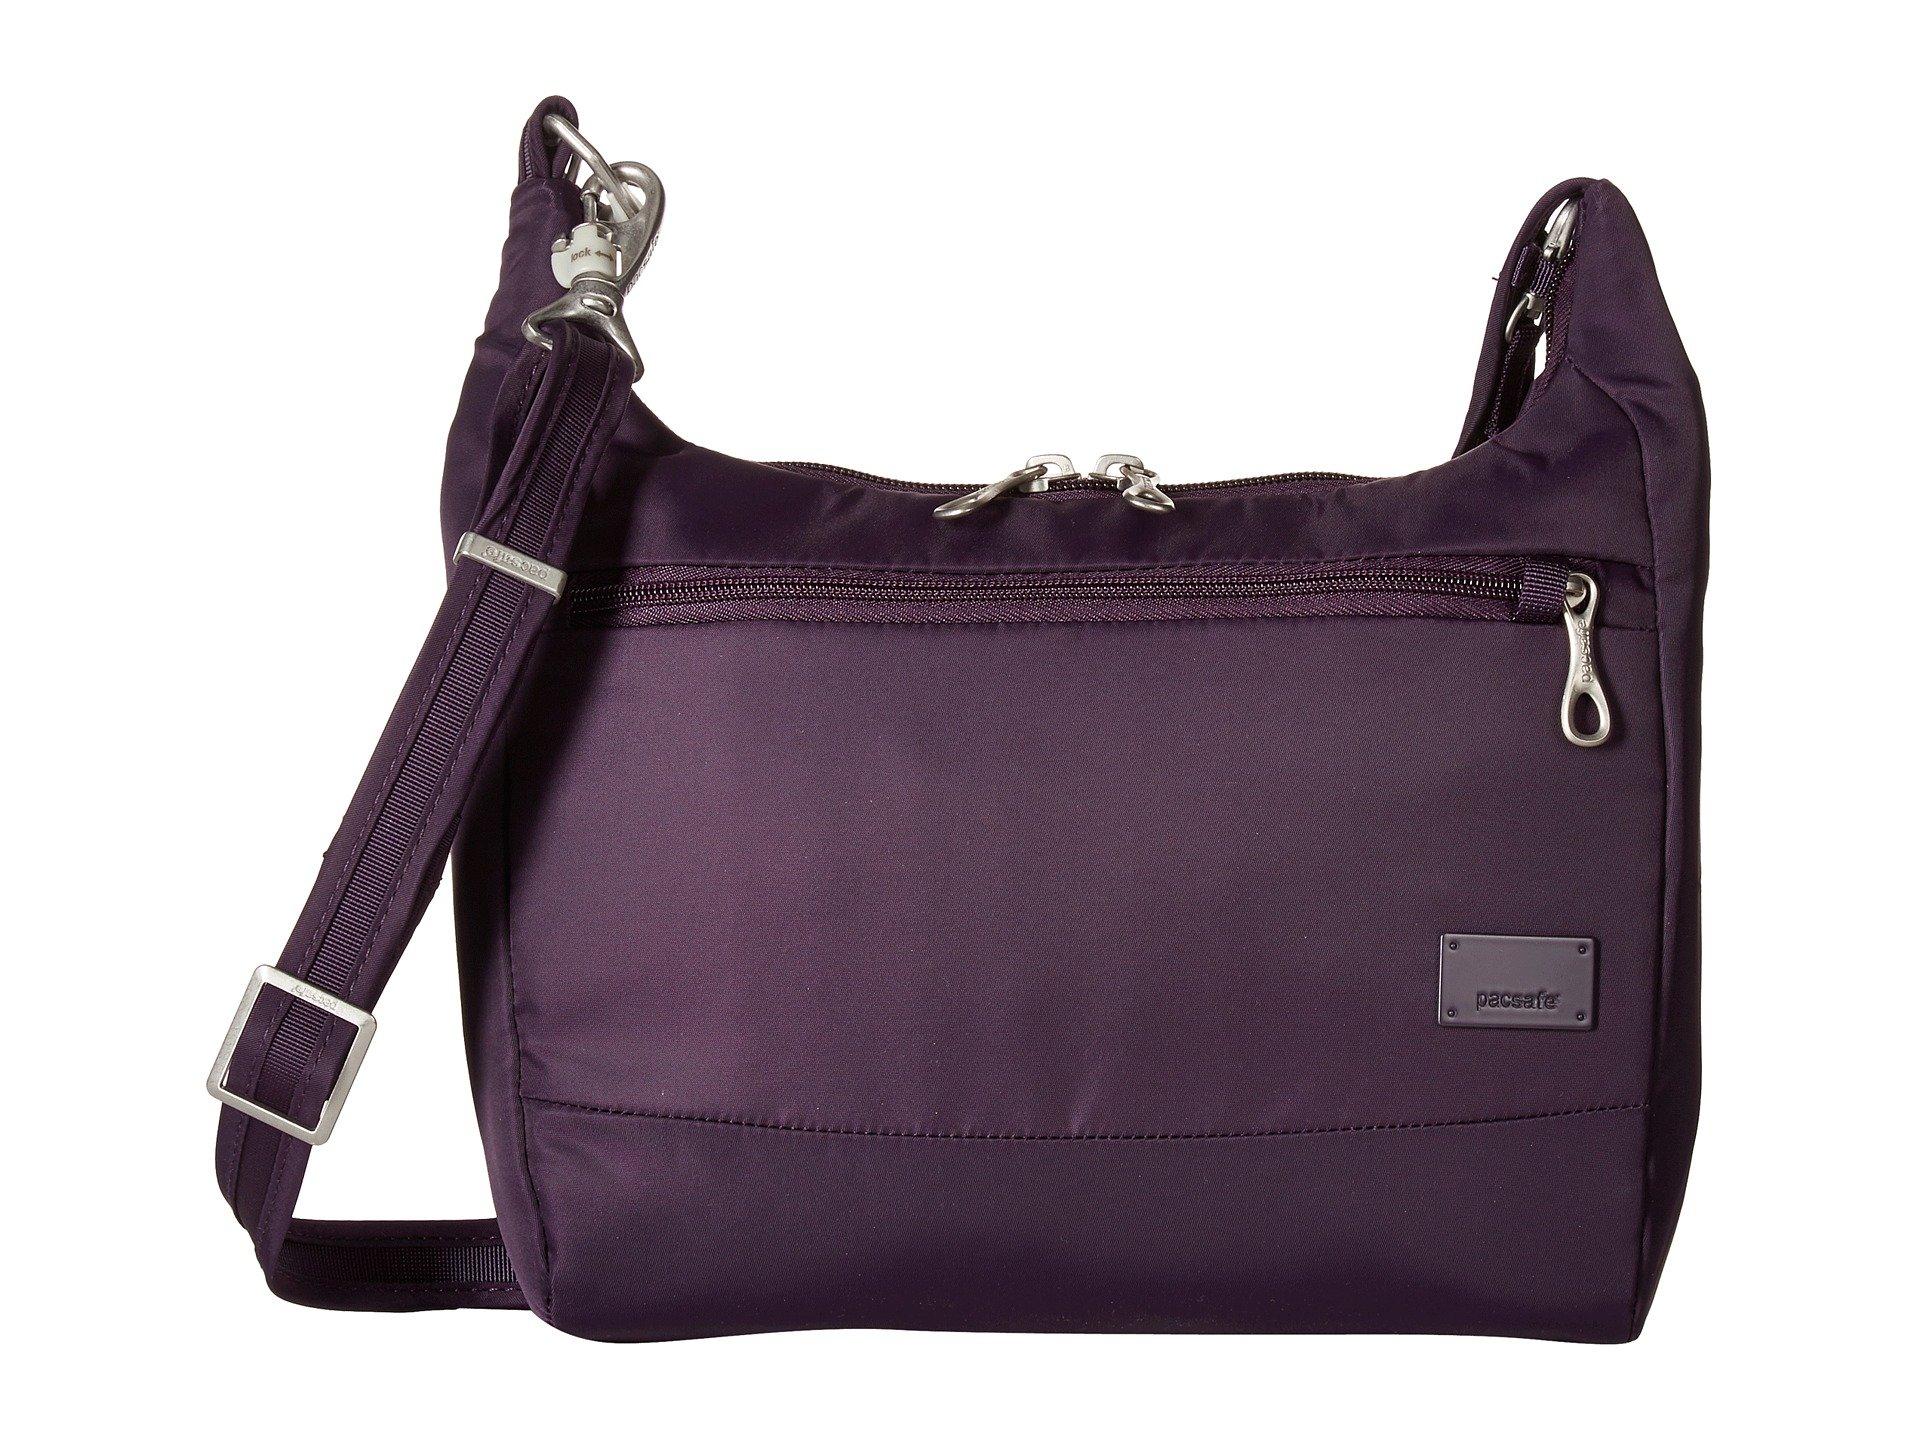 Mulberry Travel theft Anti Citysafe Pacsafe Cs100 Handbag xFq7Yn0w